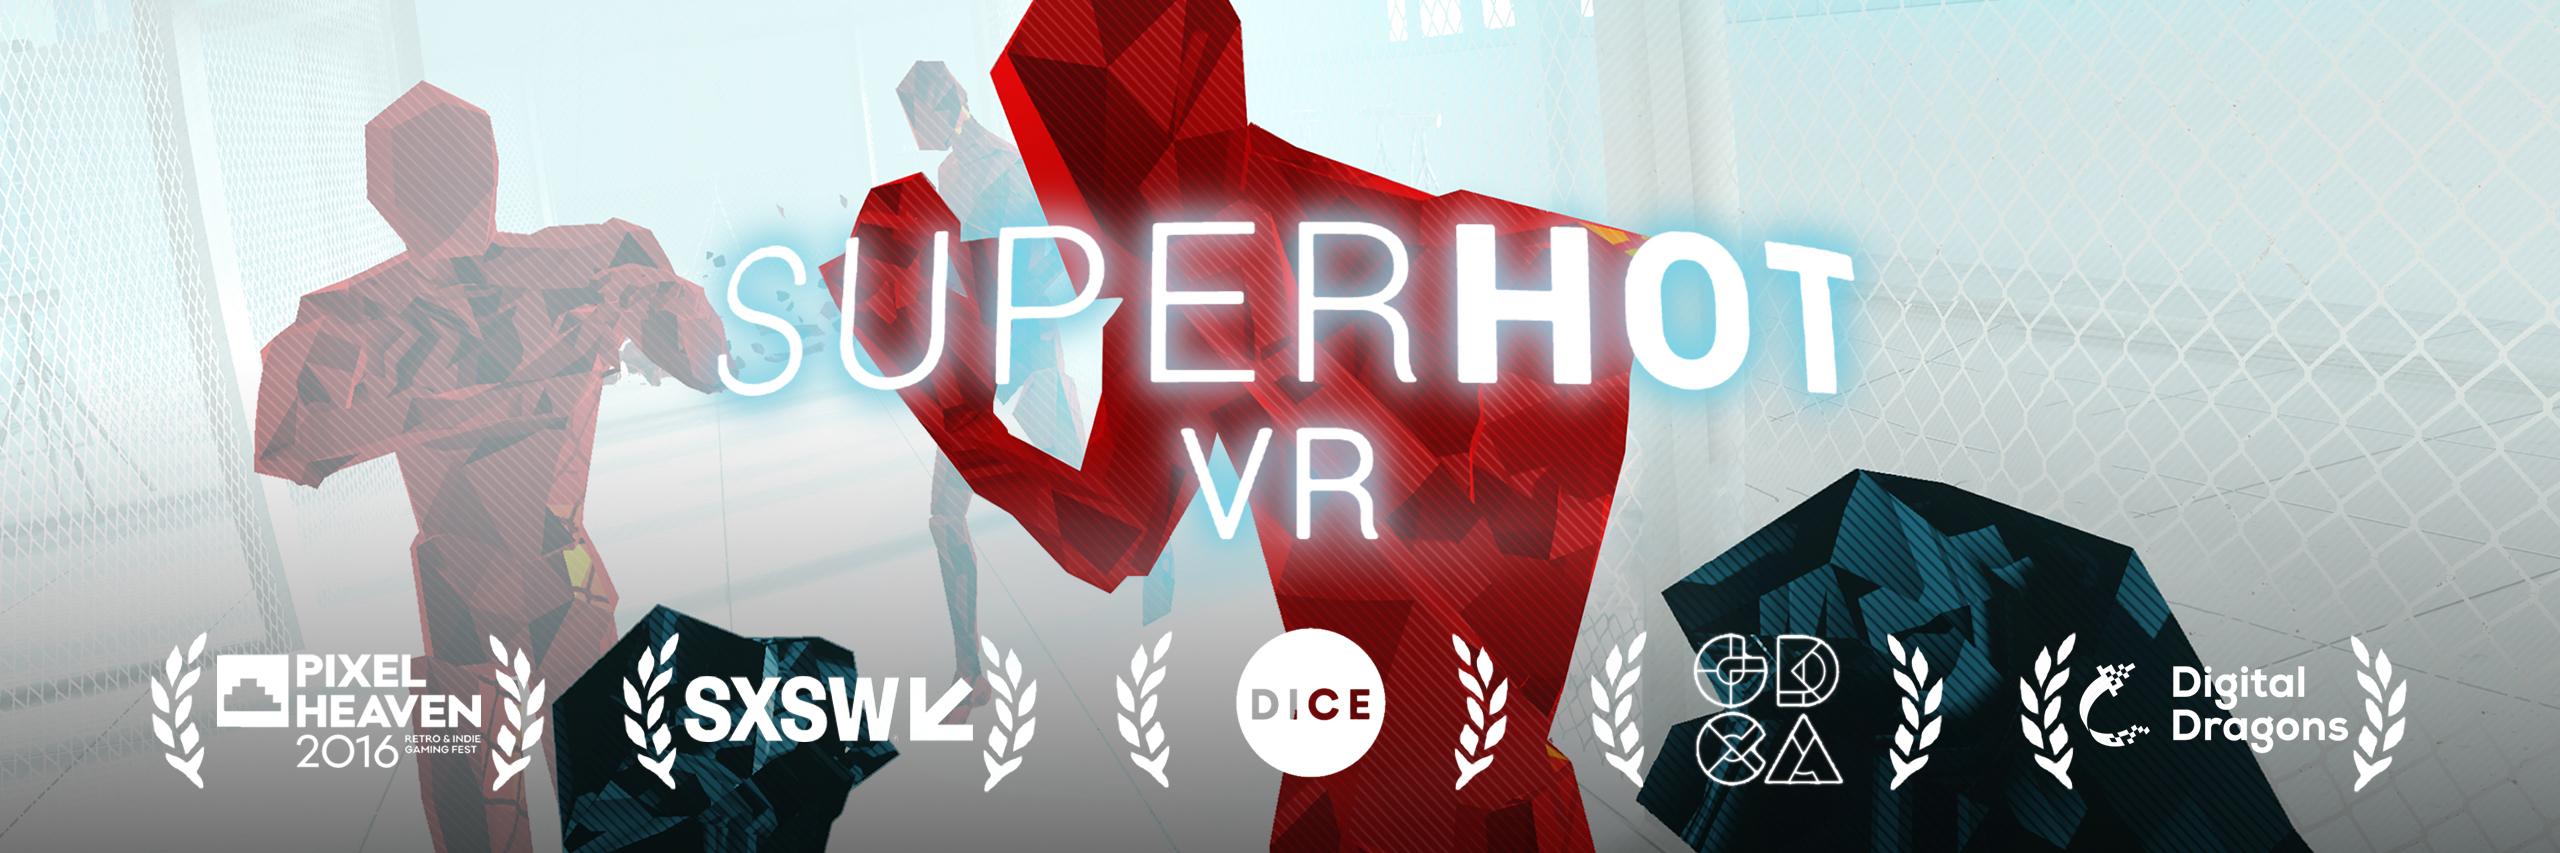 SUPERHOT VR on Oculus Quest | Terminals